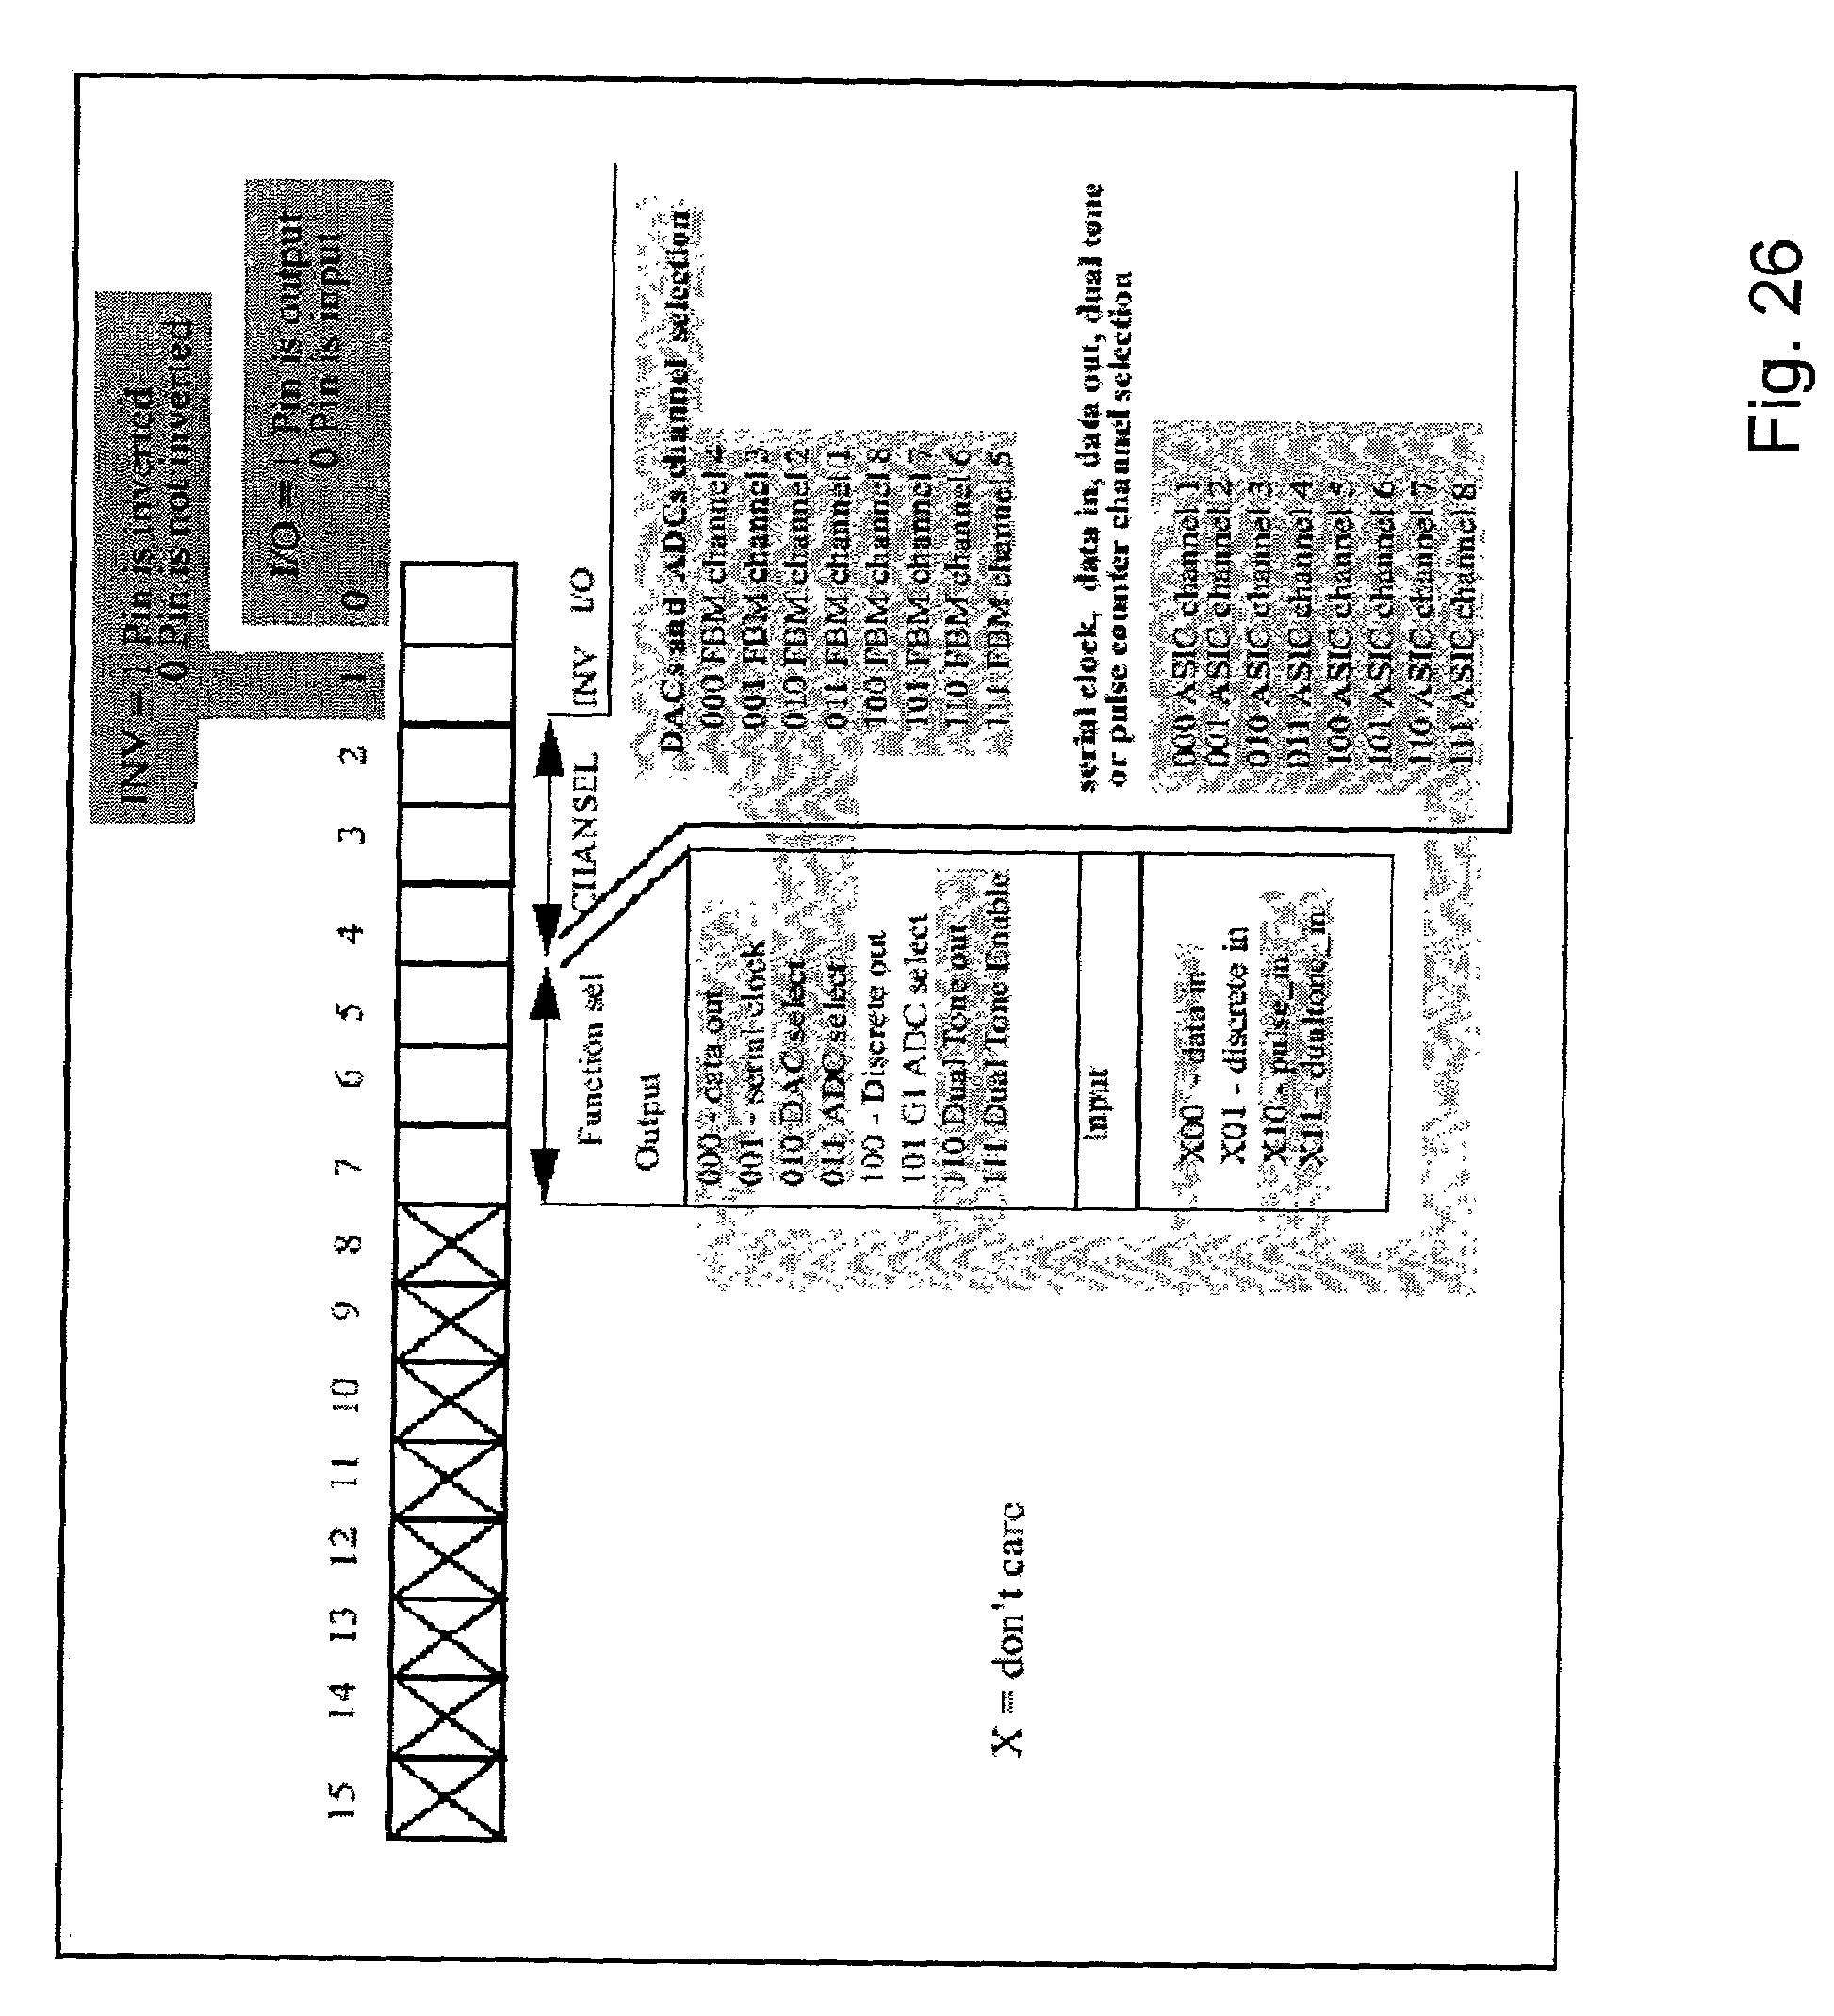 Exelent Xt Power Supply Pinout Model - Wiring Diagram Ideas ...